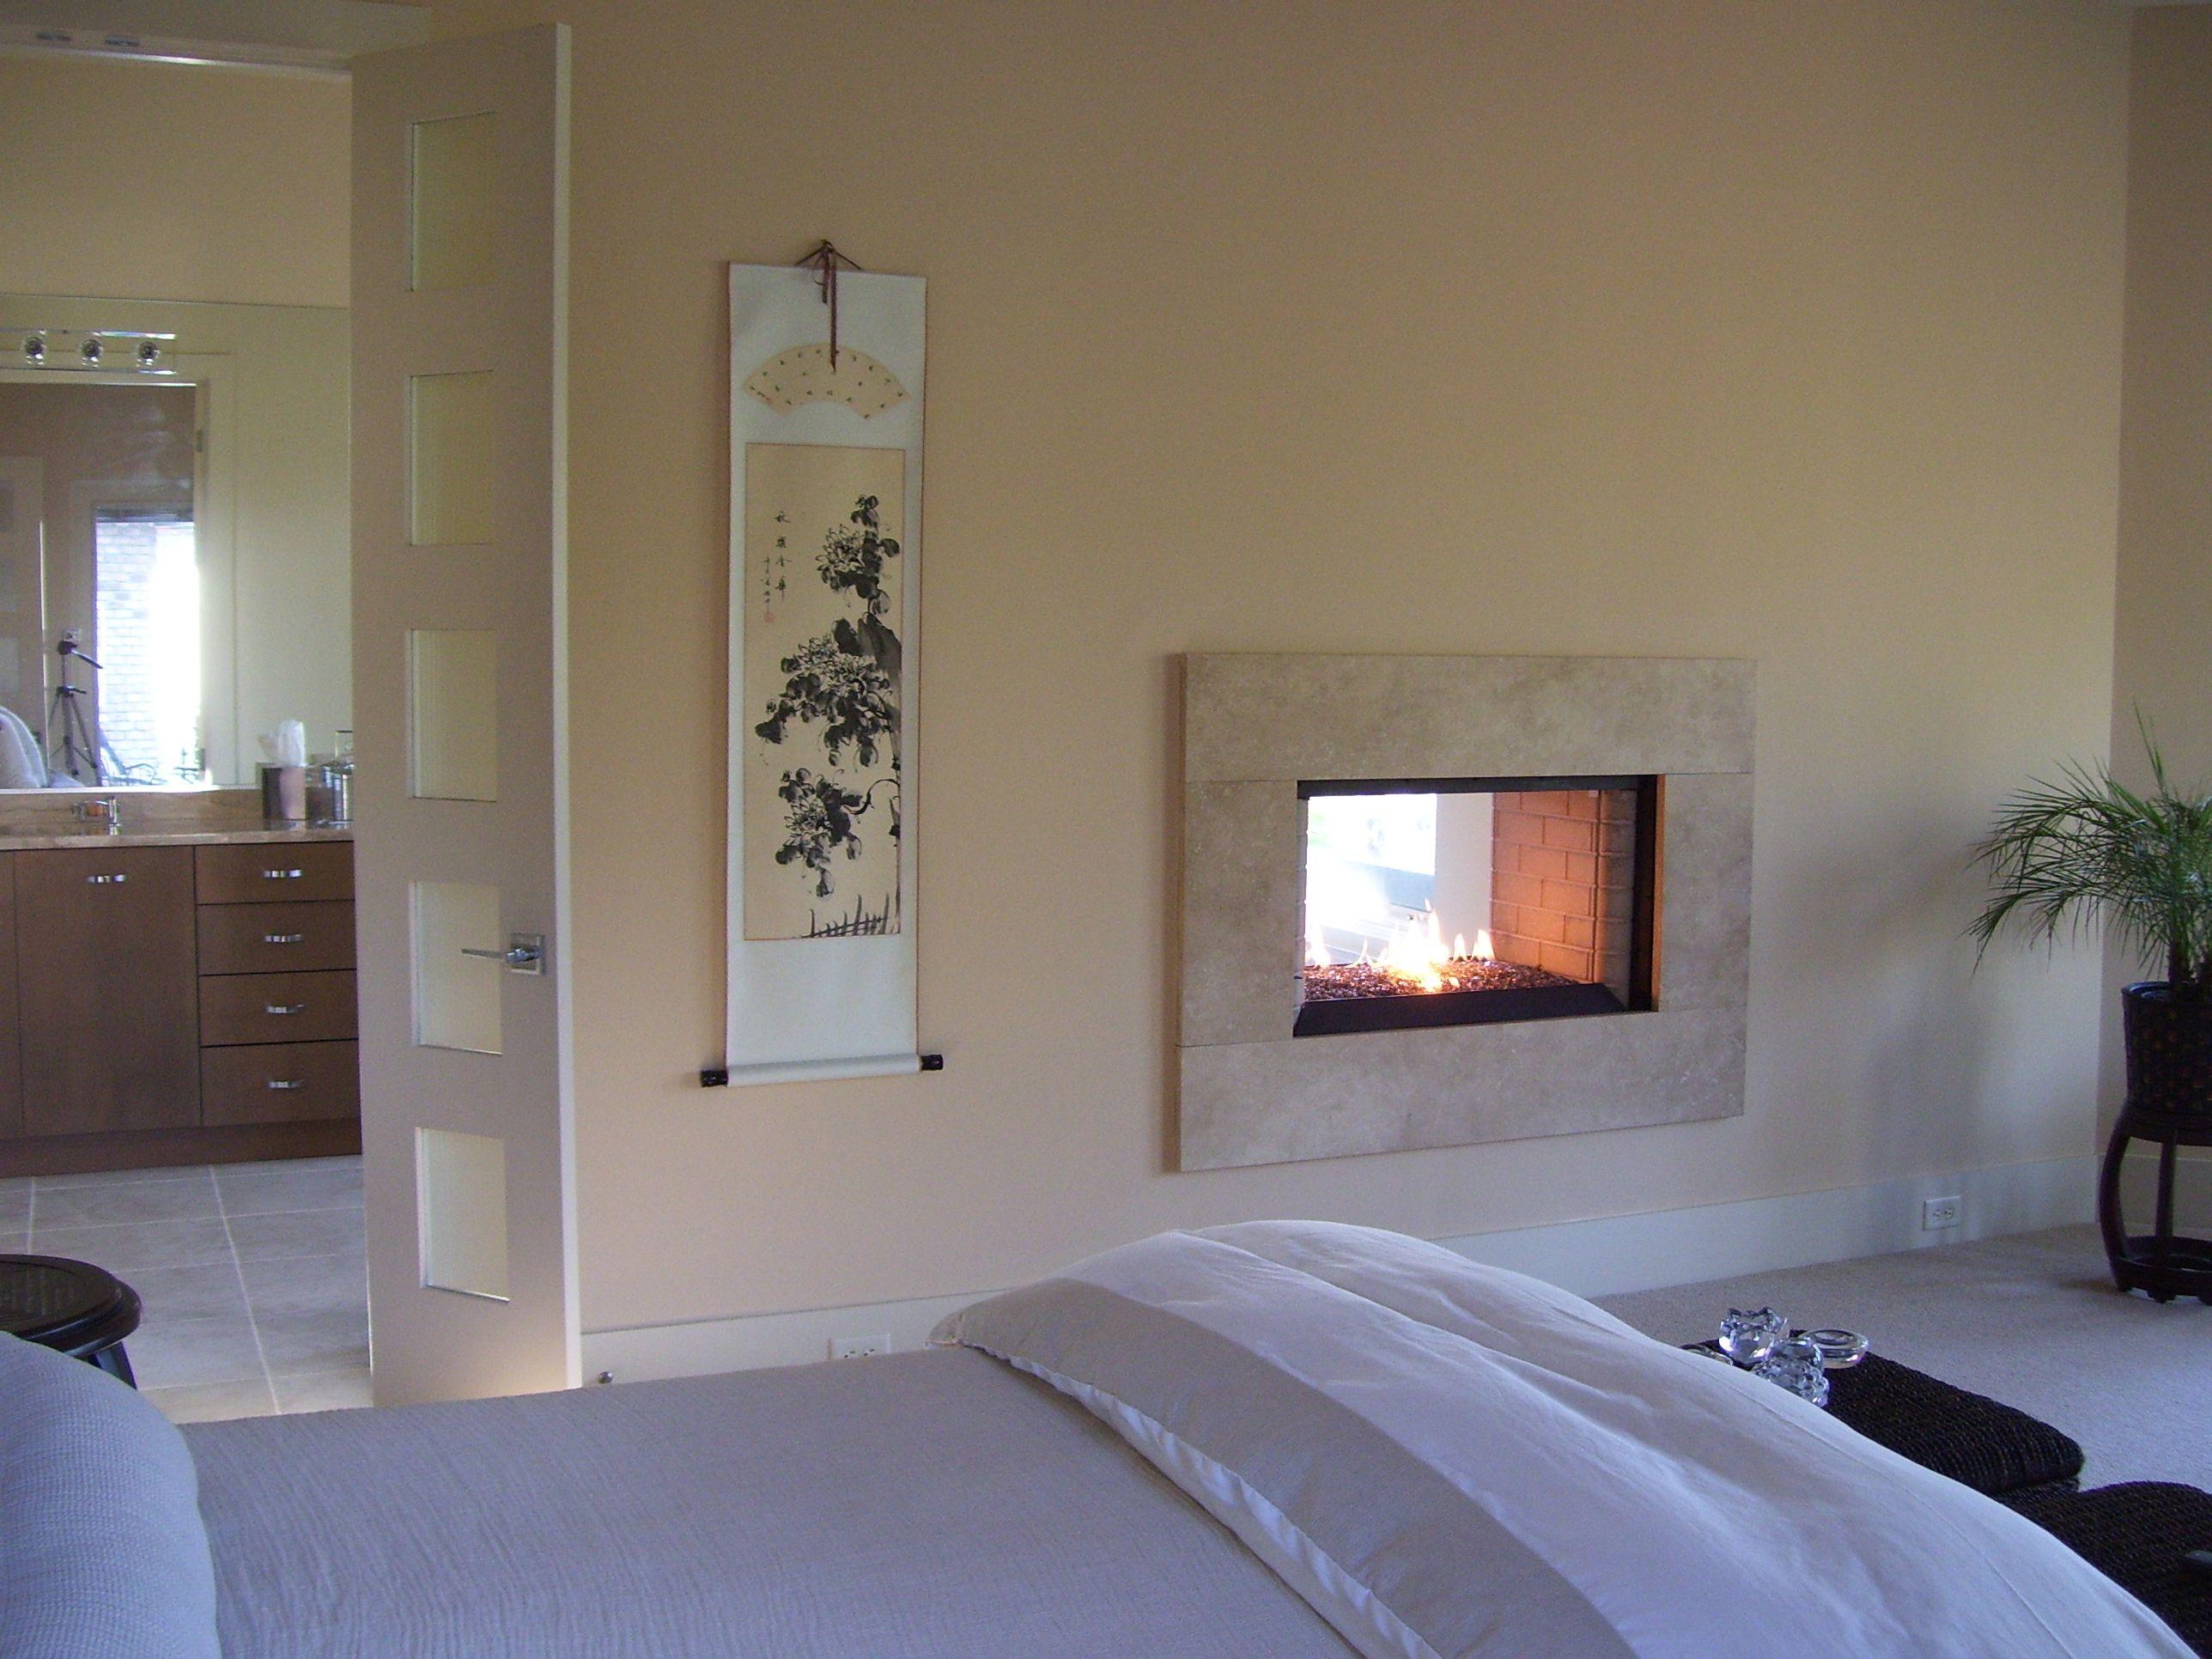 pdp ca home flame electric fireglass hughes real wayfair improvement fireplace reviews